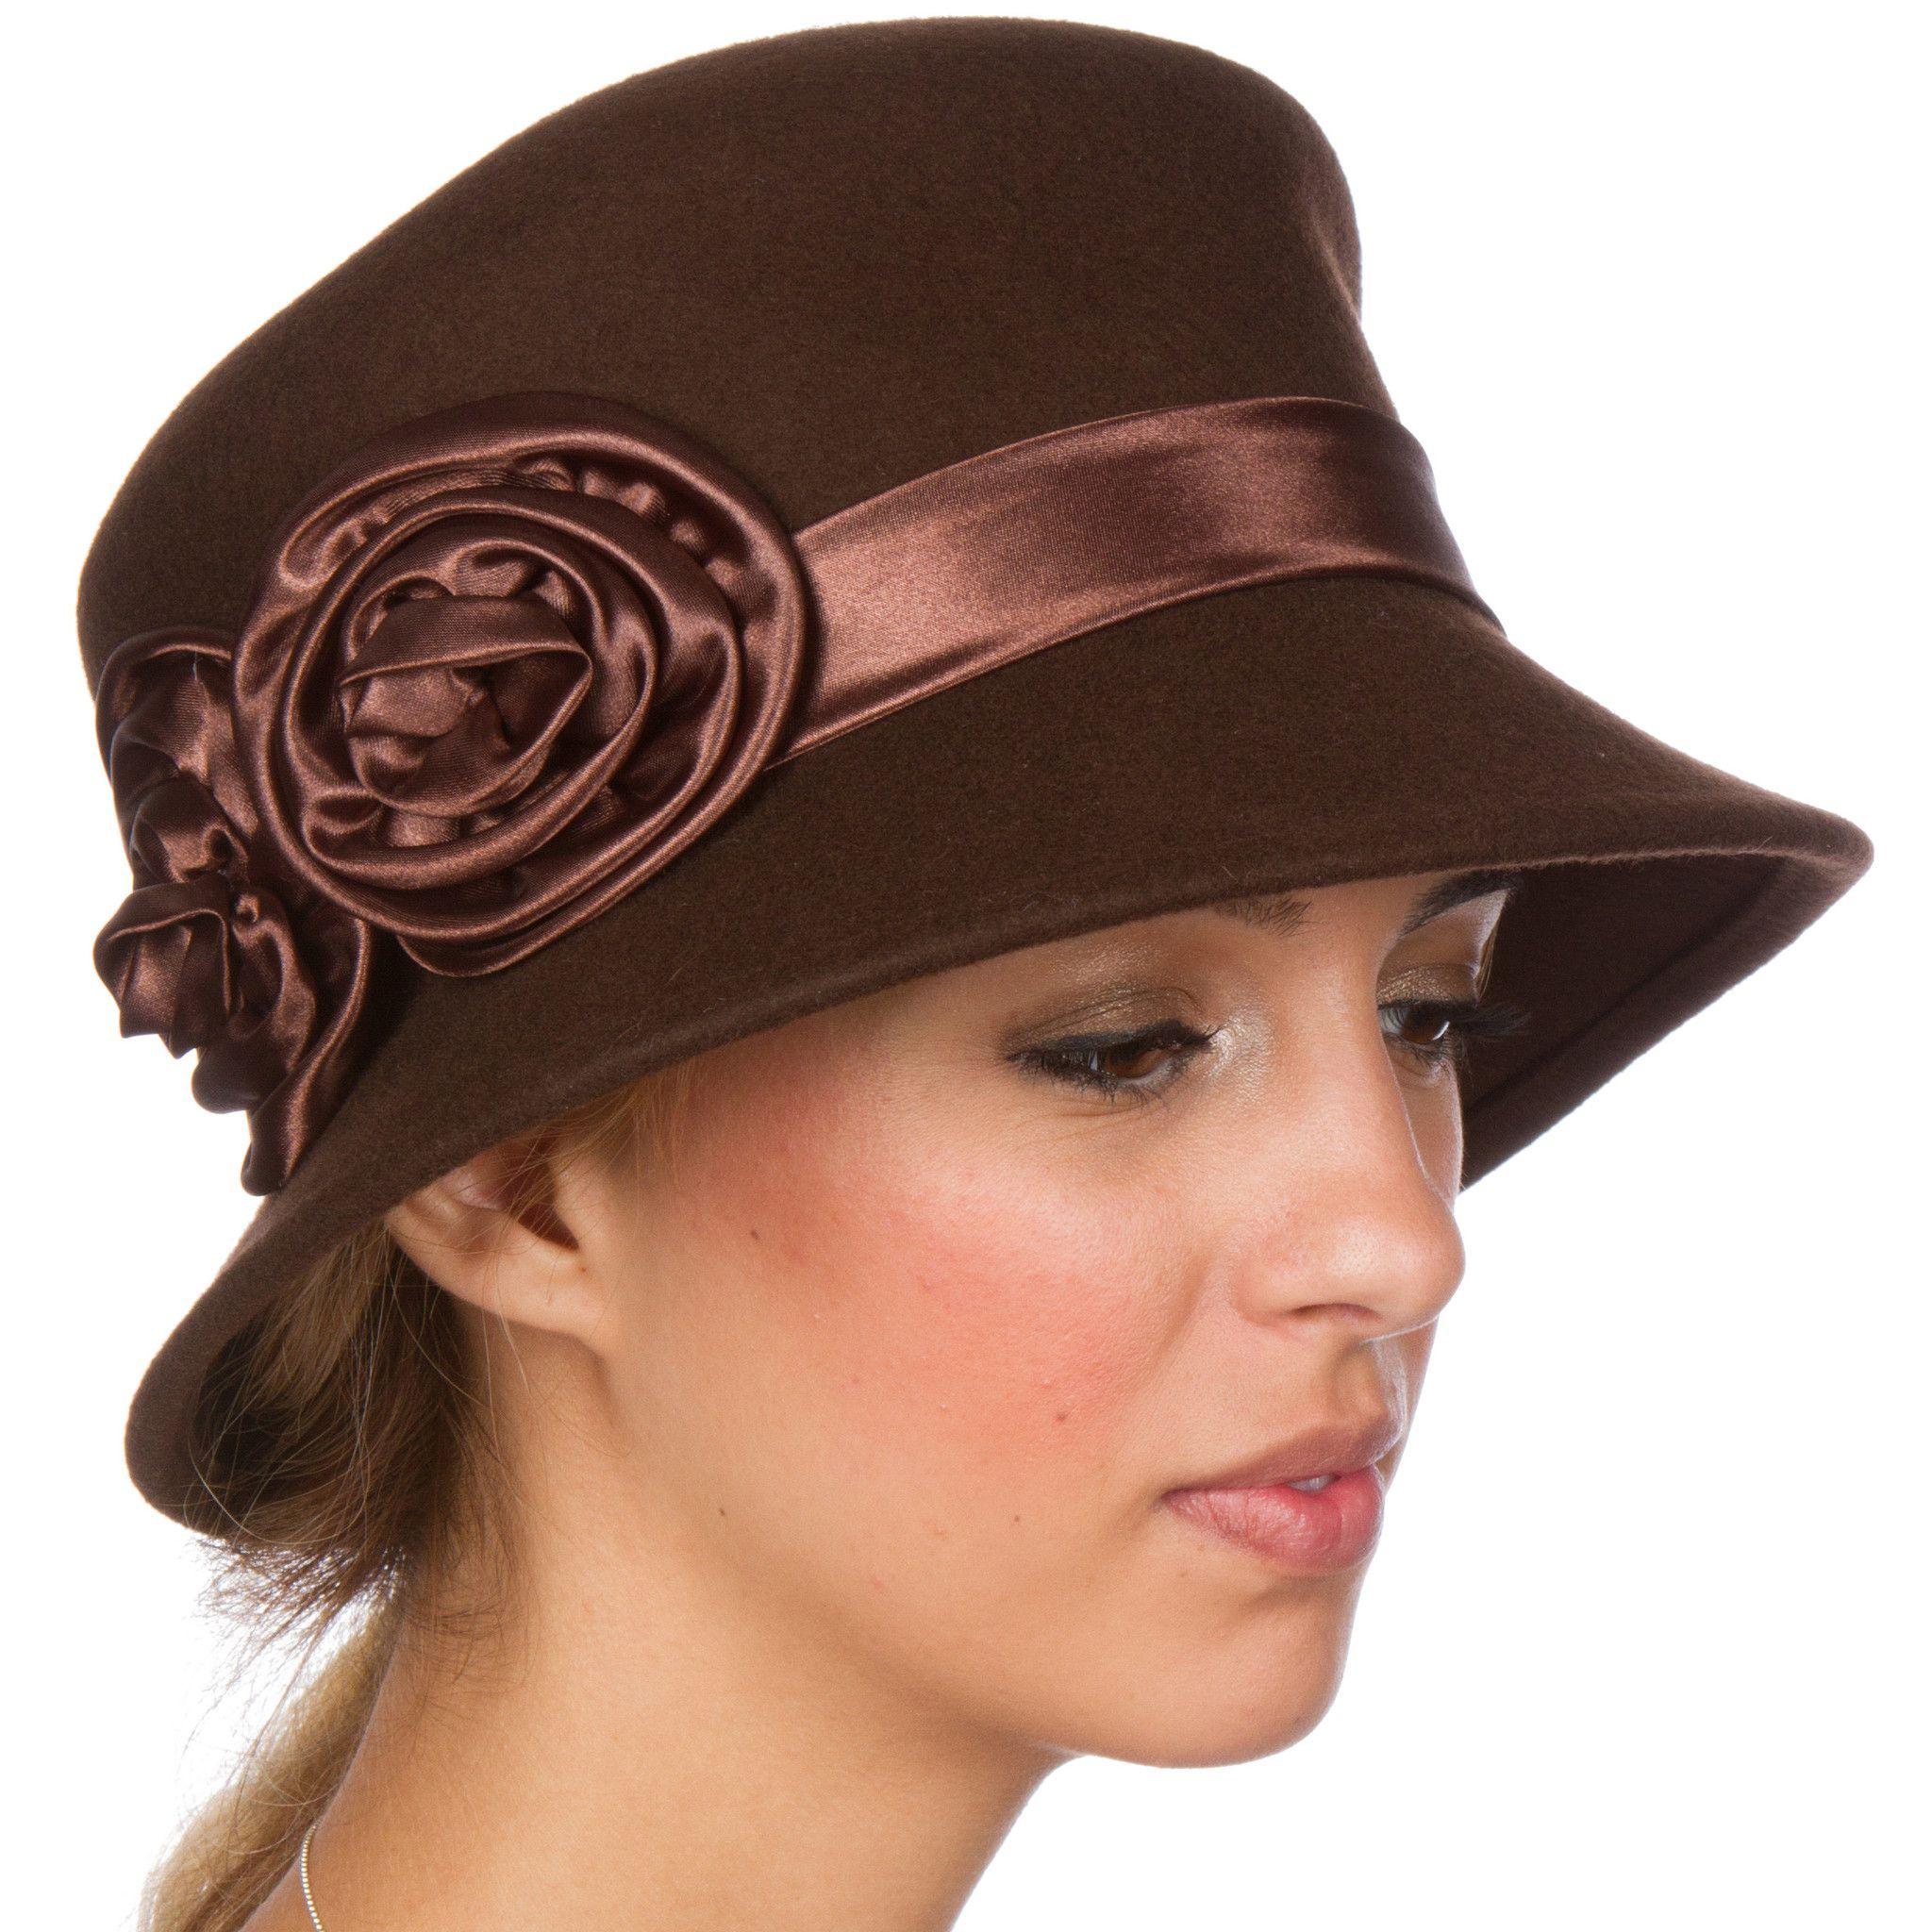 7b1883bc8f3 Sakkas Alice Satin Rose Vintage Style Wool Cloche Hat